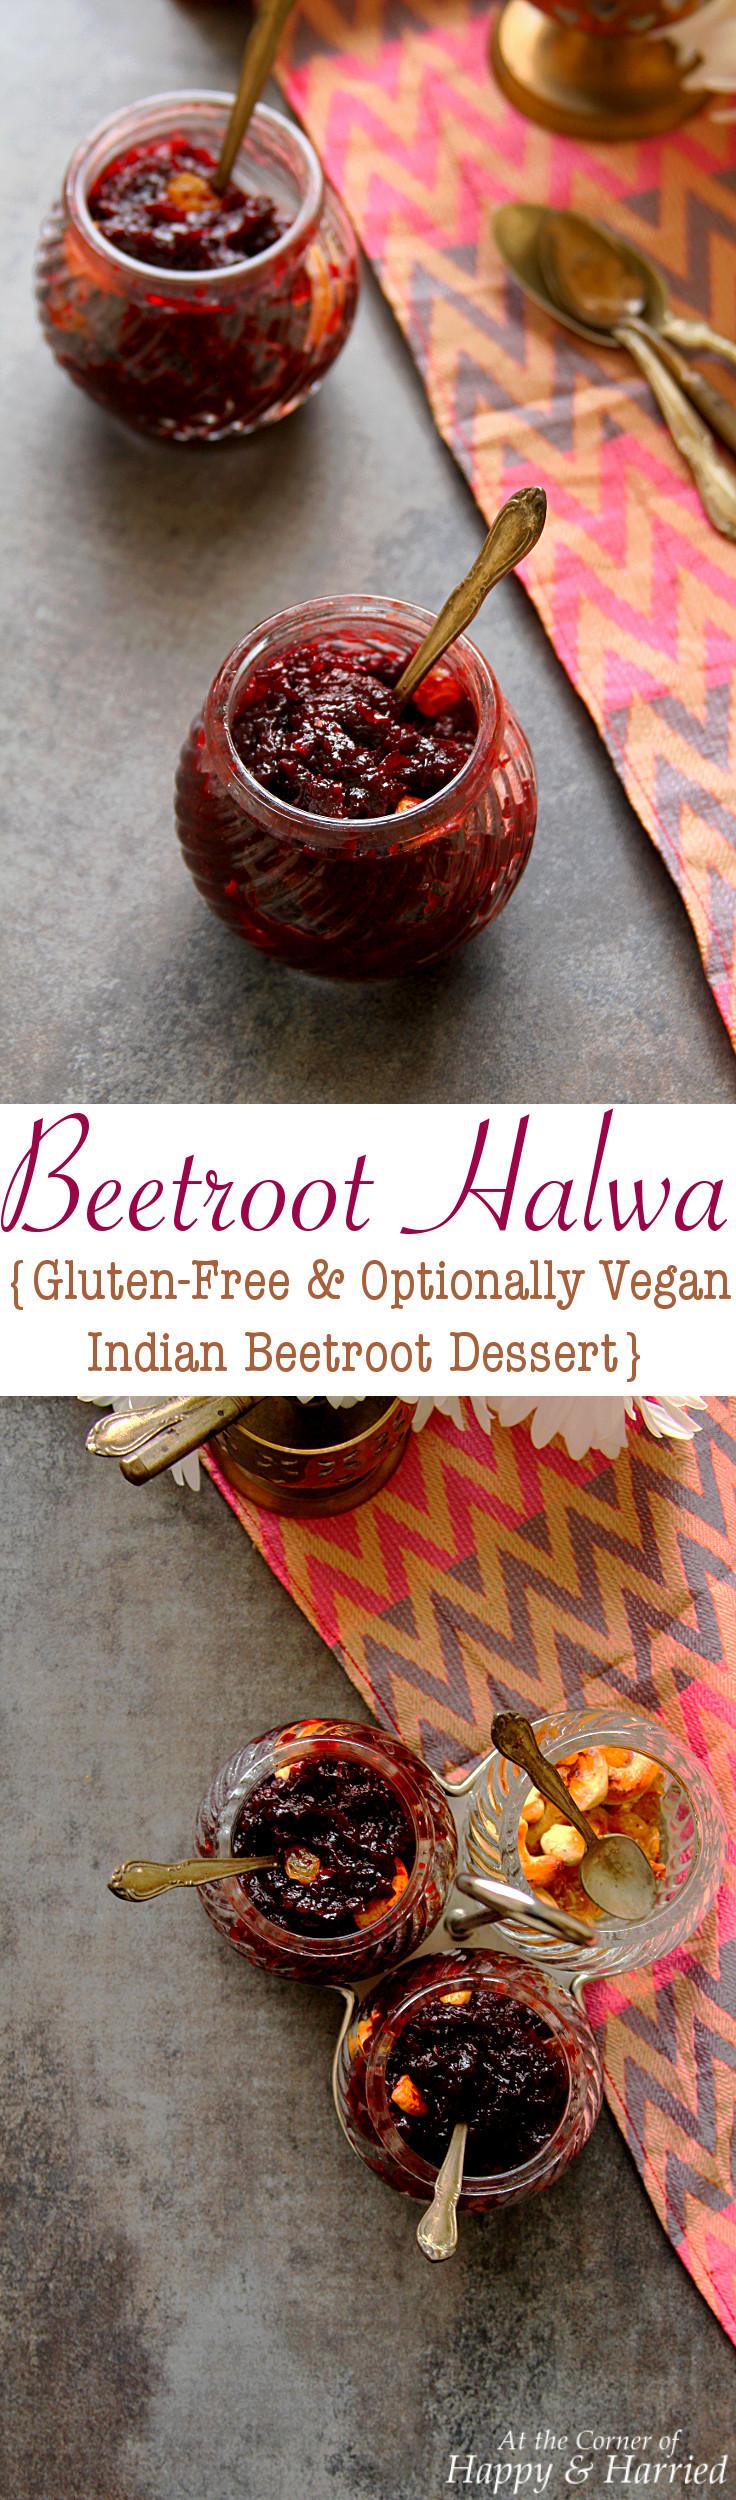 BEETROOT HALWA {GF & OPTIONALLY VEGAN INDIAN DESSERT} - HAPPY&HARRIED